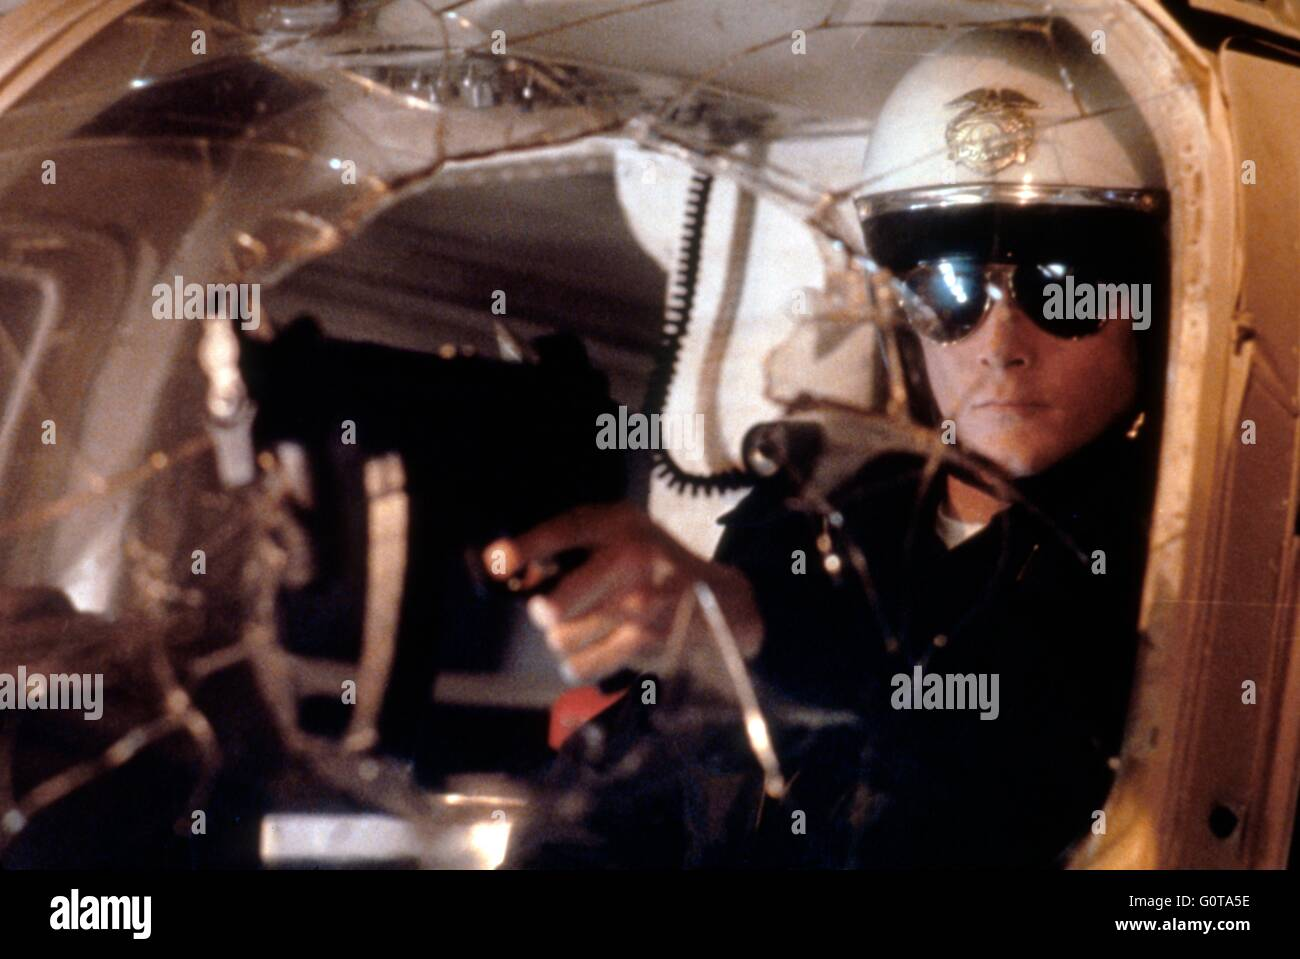 Robert Patrick / Terminator 2 : Judgment Day / 1991 directed by James Cameron (Carolco Pïctures) - Stock Image